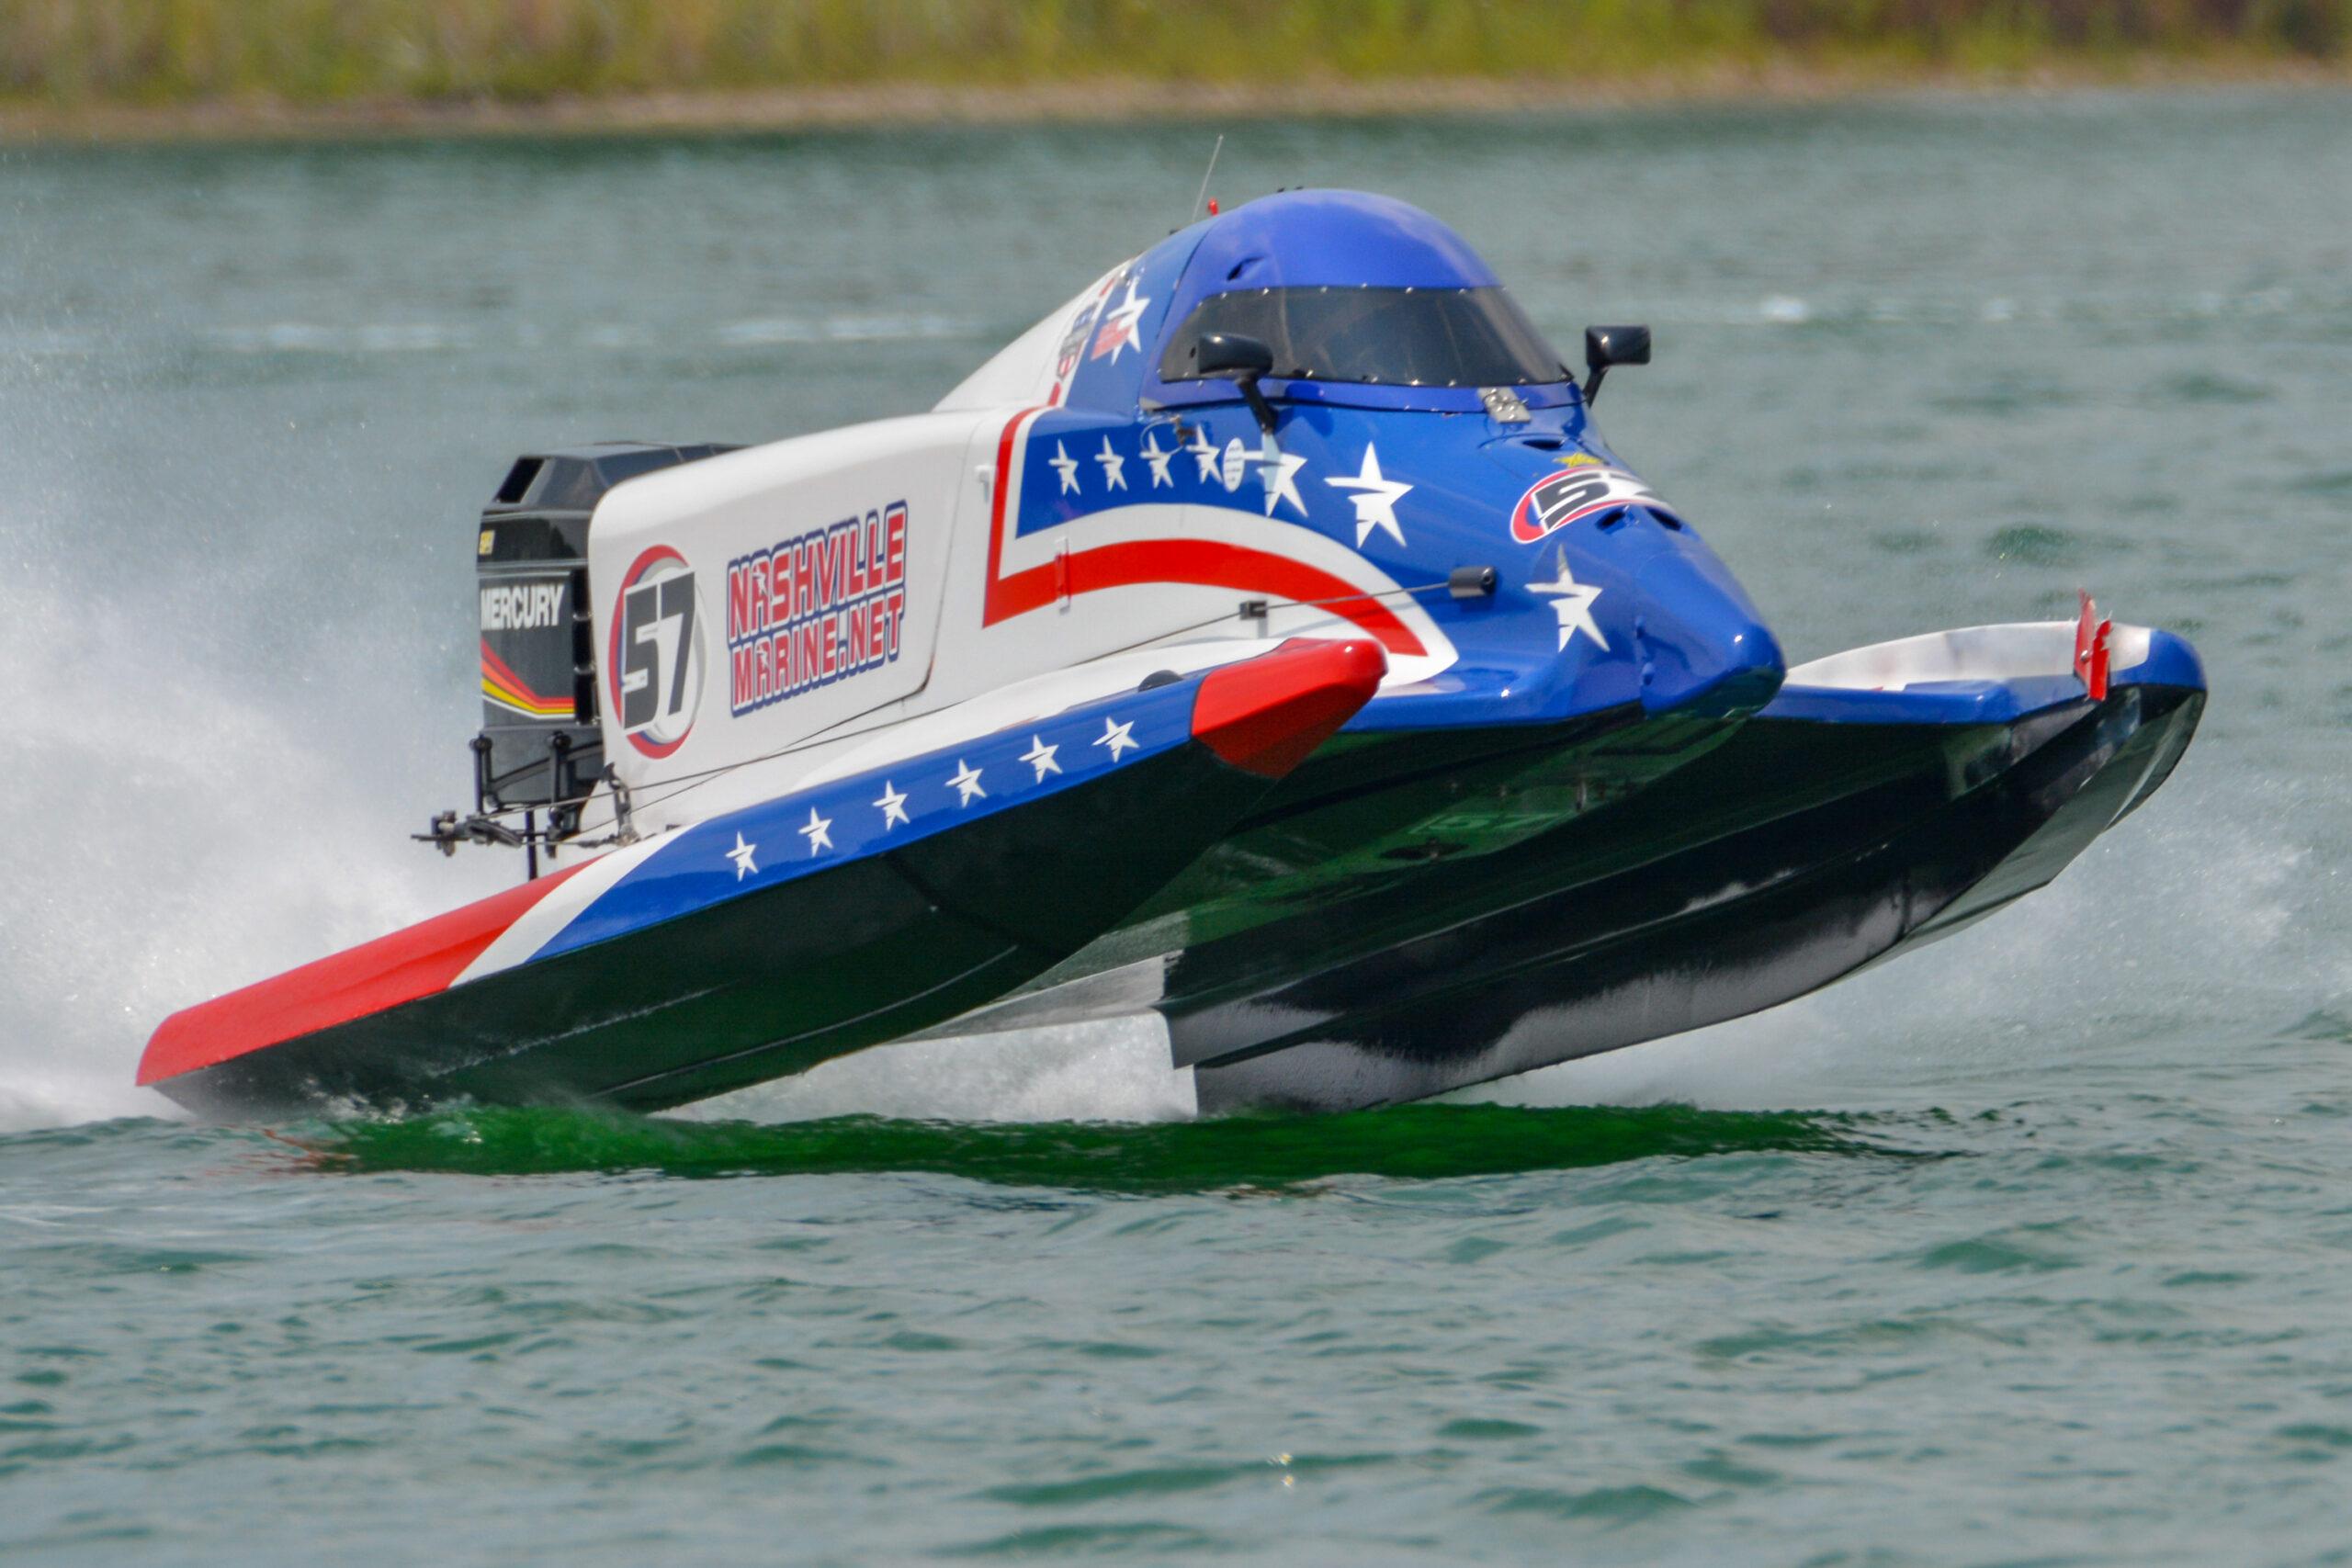 McMurray Racing Nashville Marine 2021 Springfield F1 Race-19